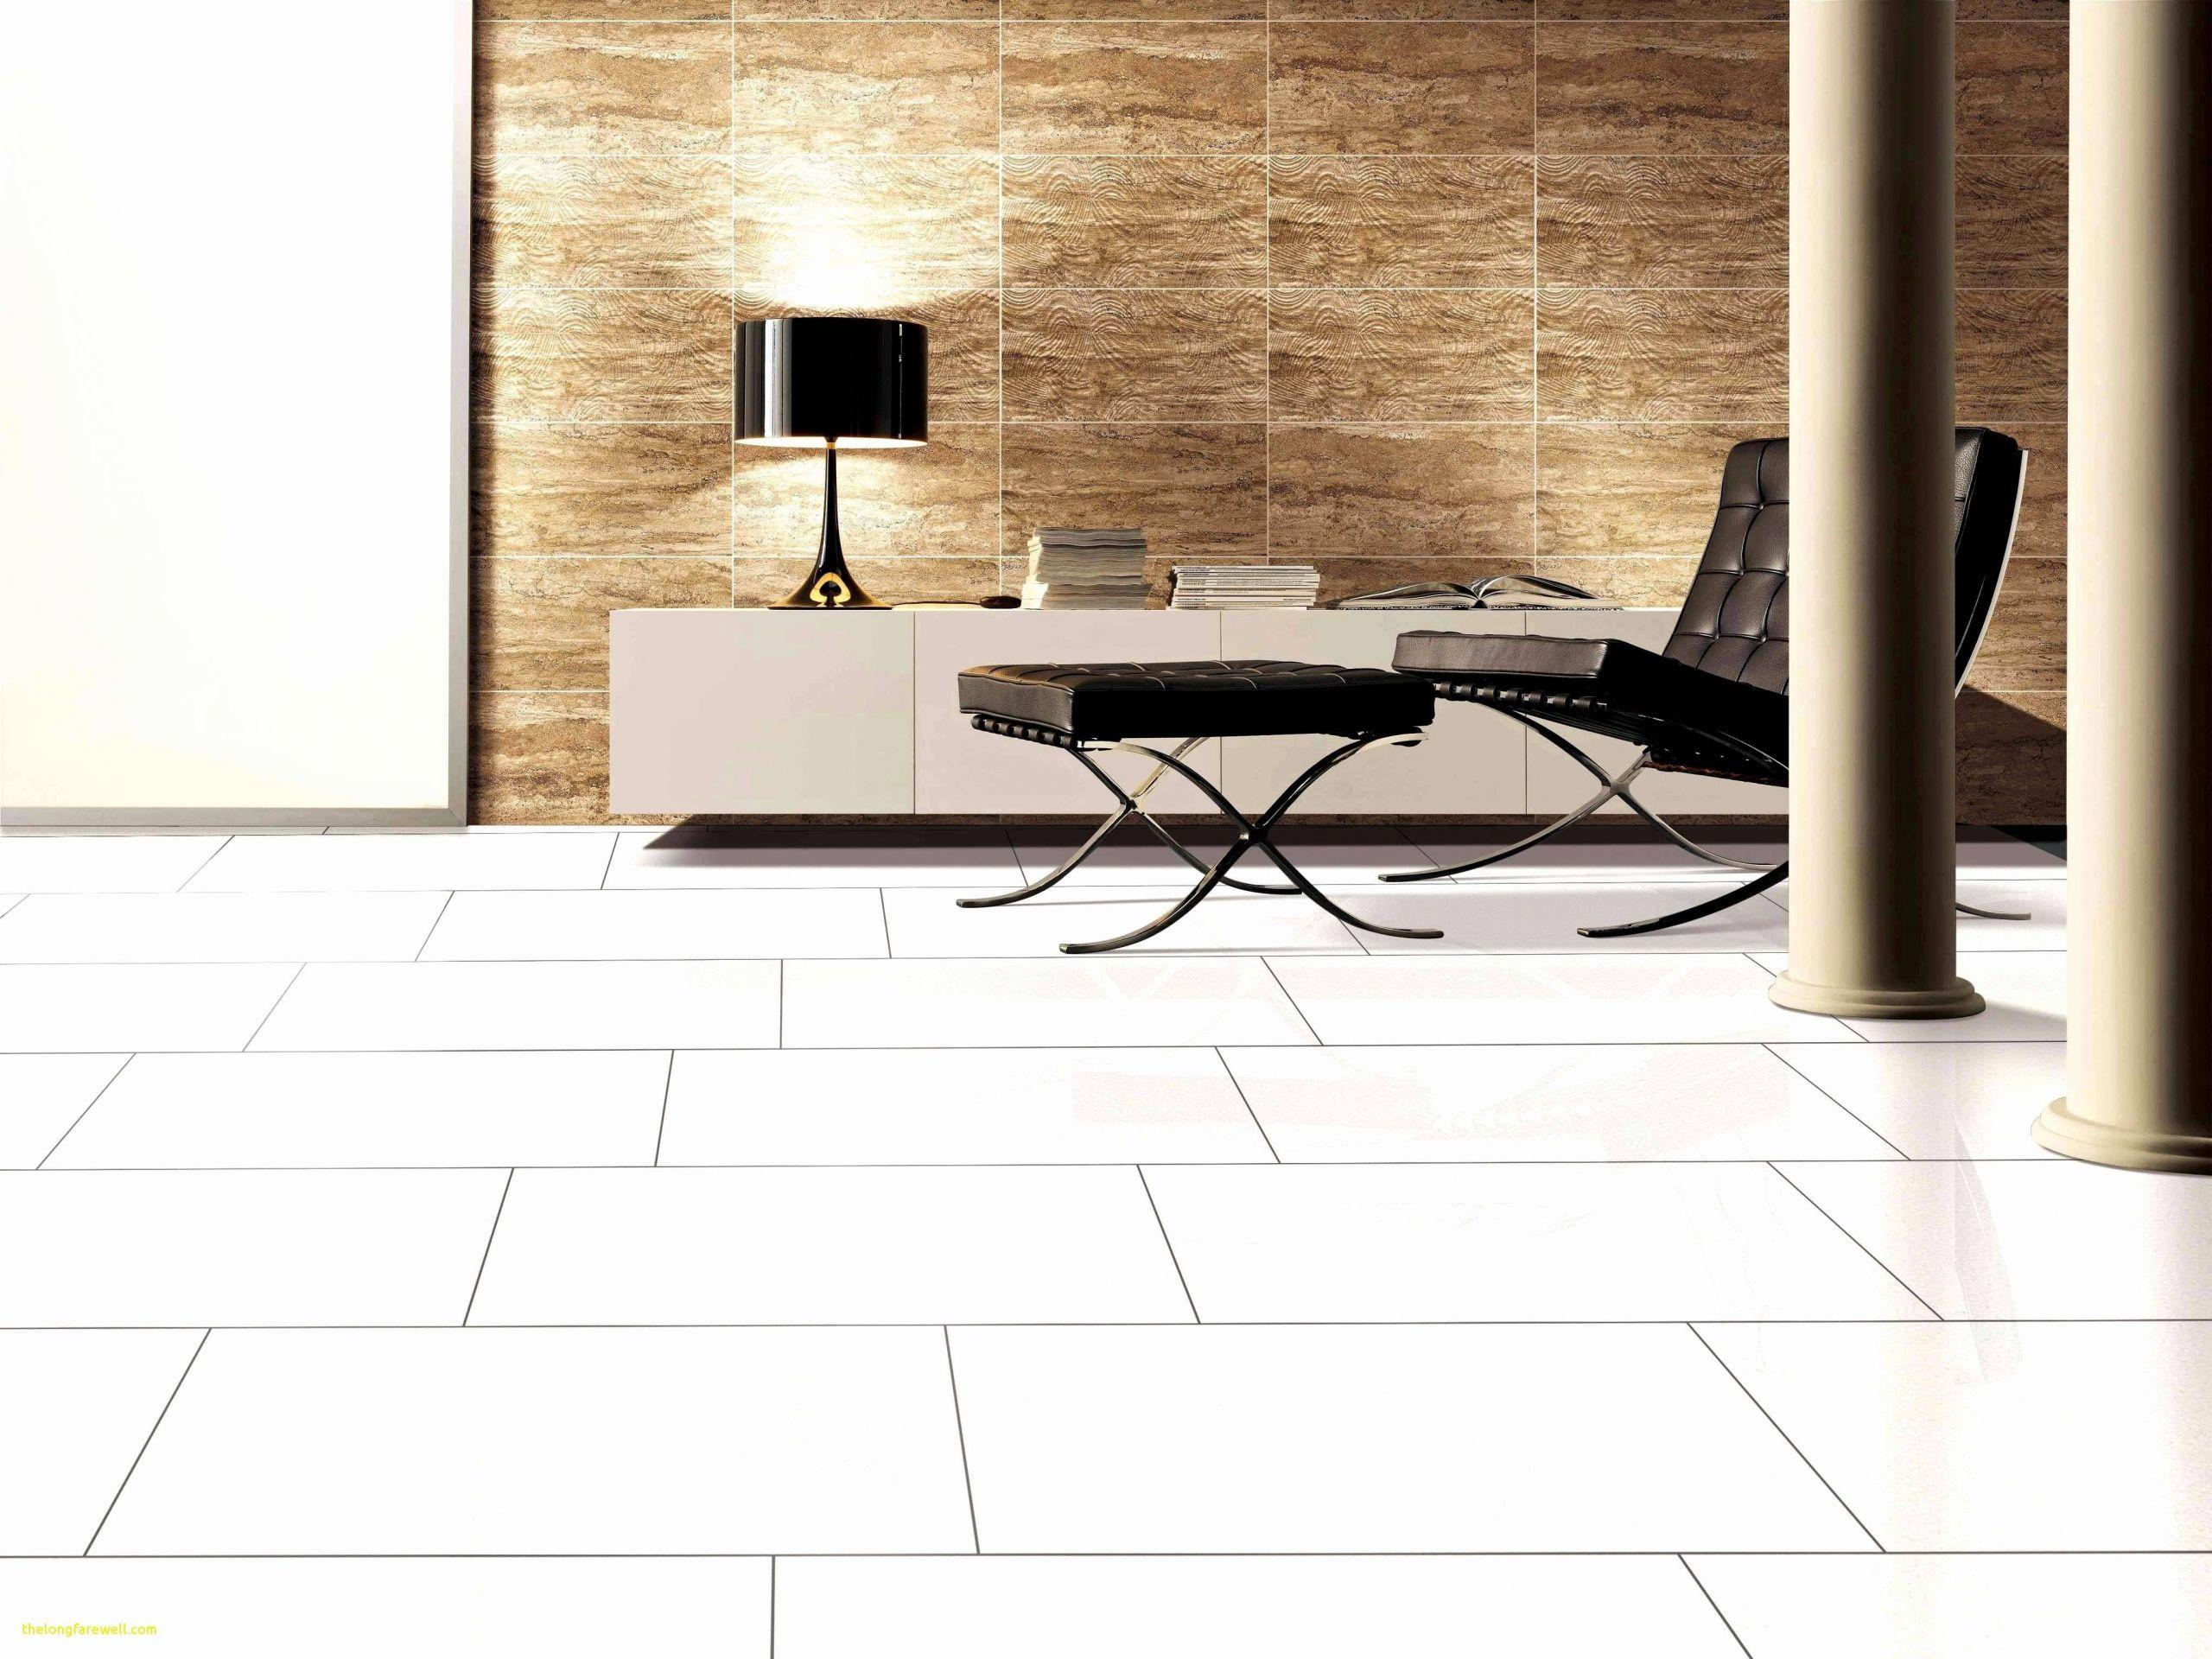 dark hardwood laminate flooring of lovely flooring for the bathroom bathroom ideas and home decoration throughout mosaic bathroom designs refrence new tile floor mosaic bathroom 0d new bathr